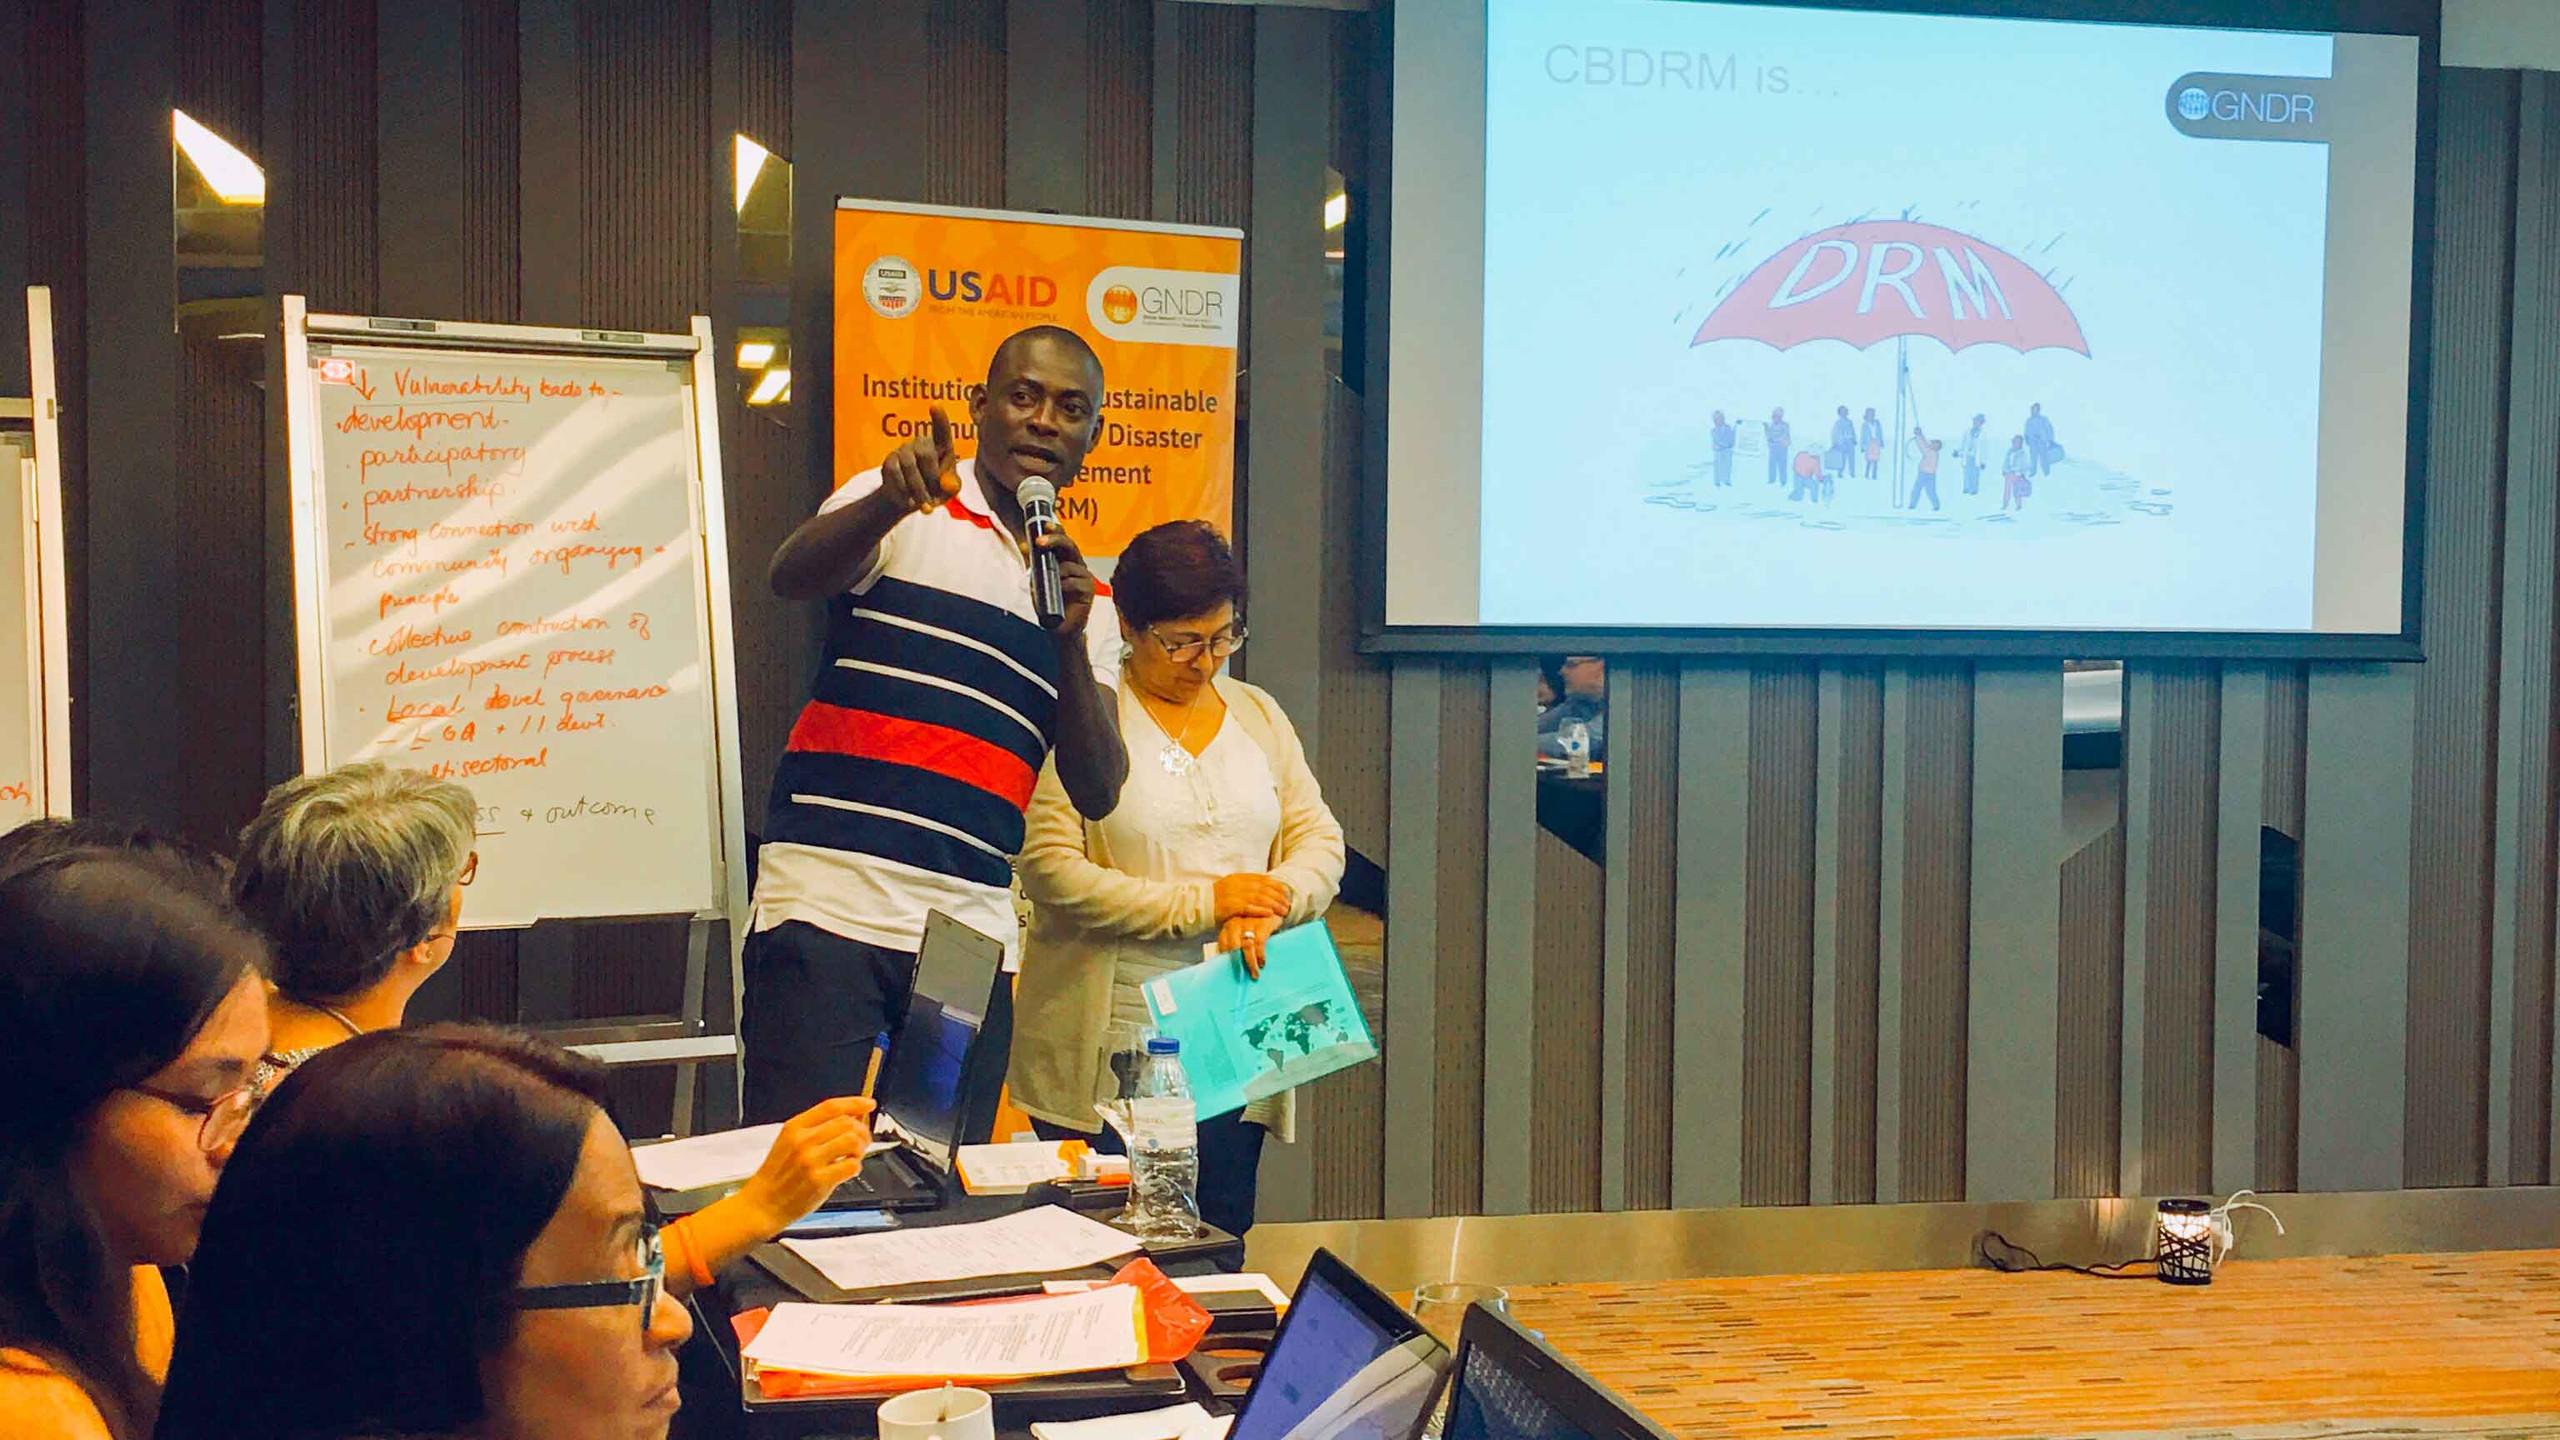 Each country representative also presented their experience in CBDRM